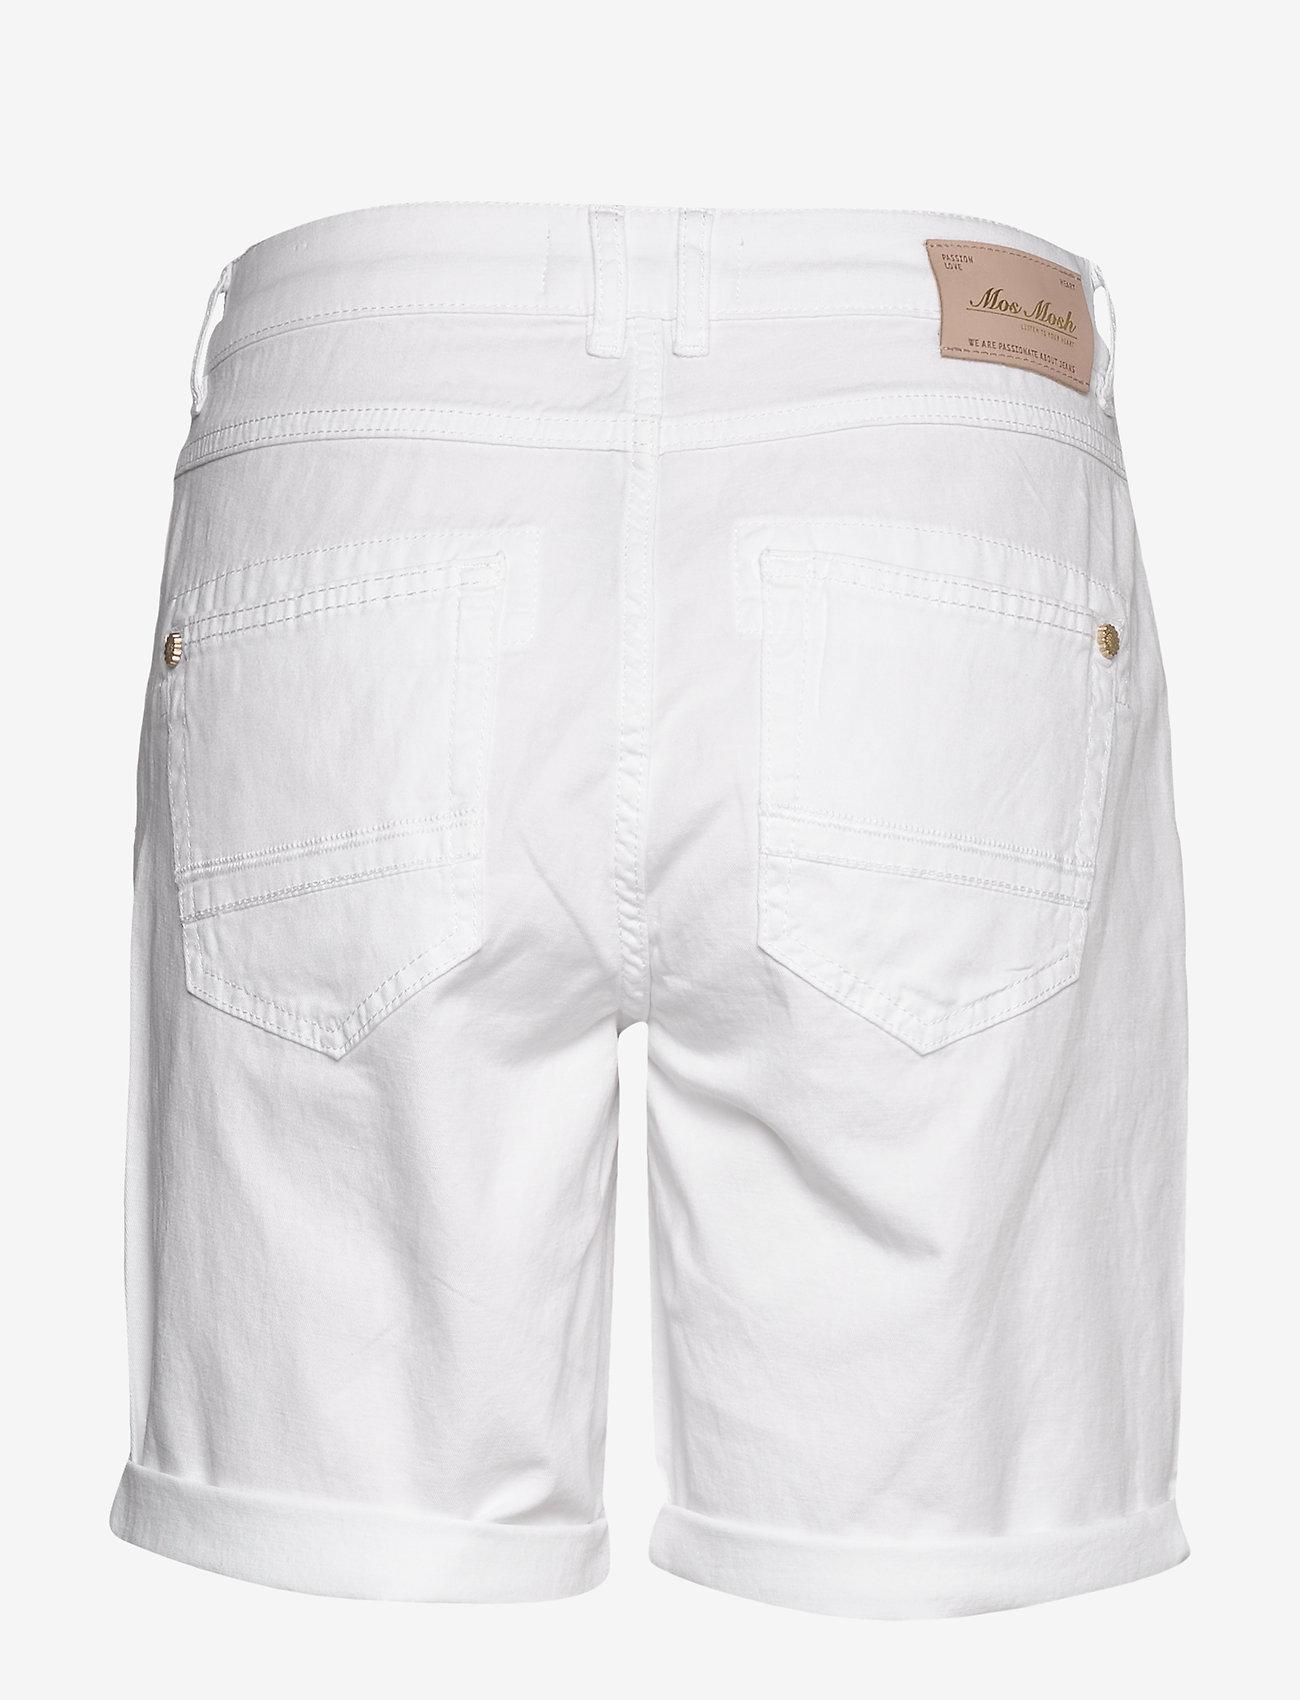 Naomi Decor G.d Shorts (White) (999 kr) - MOS MOSH